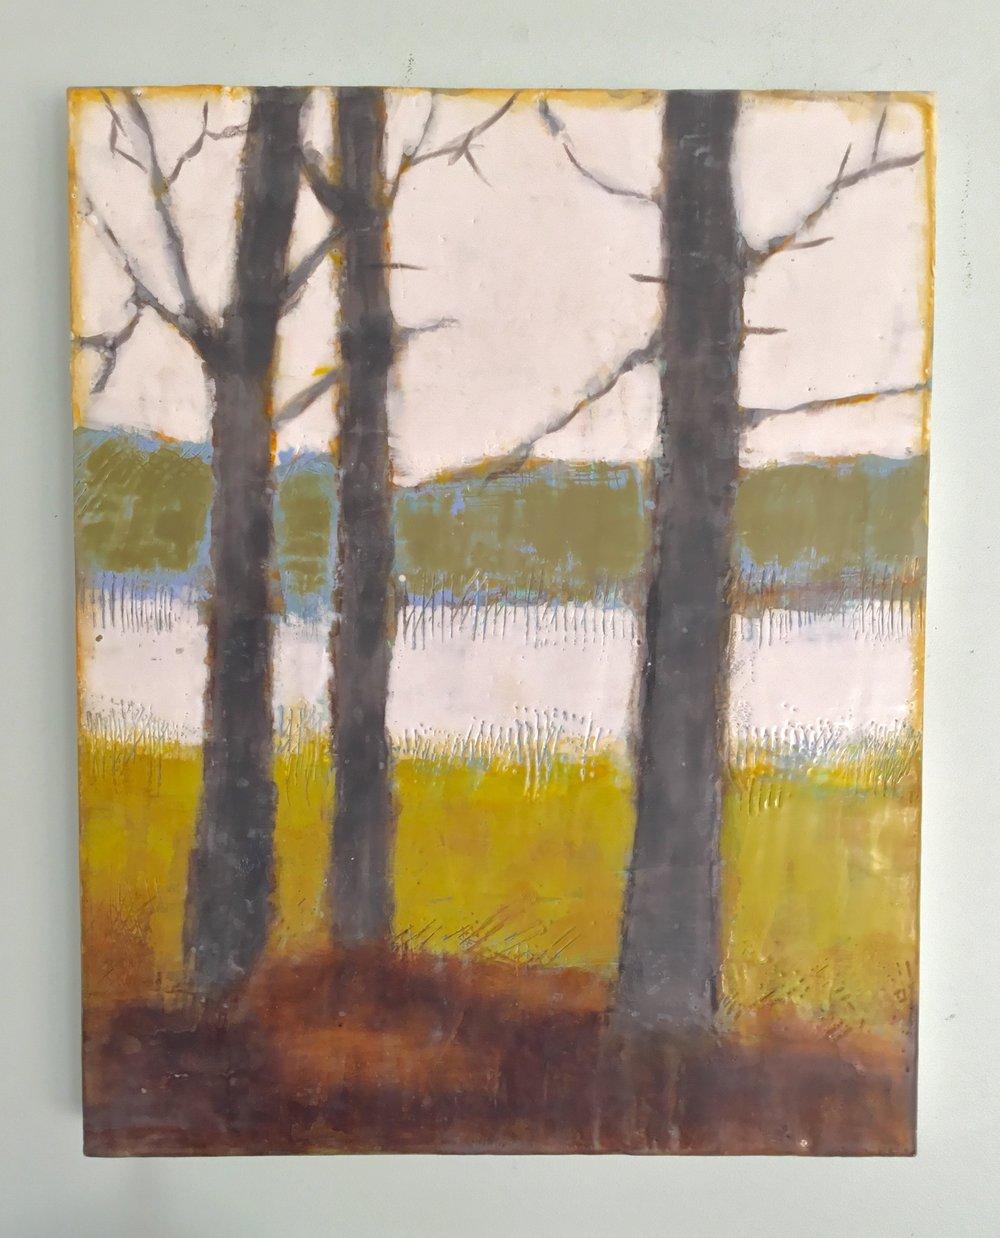 Lakeview (aka Tree Bones)